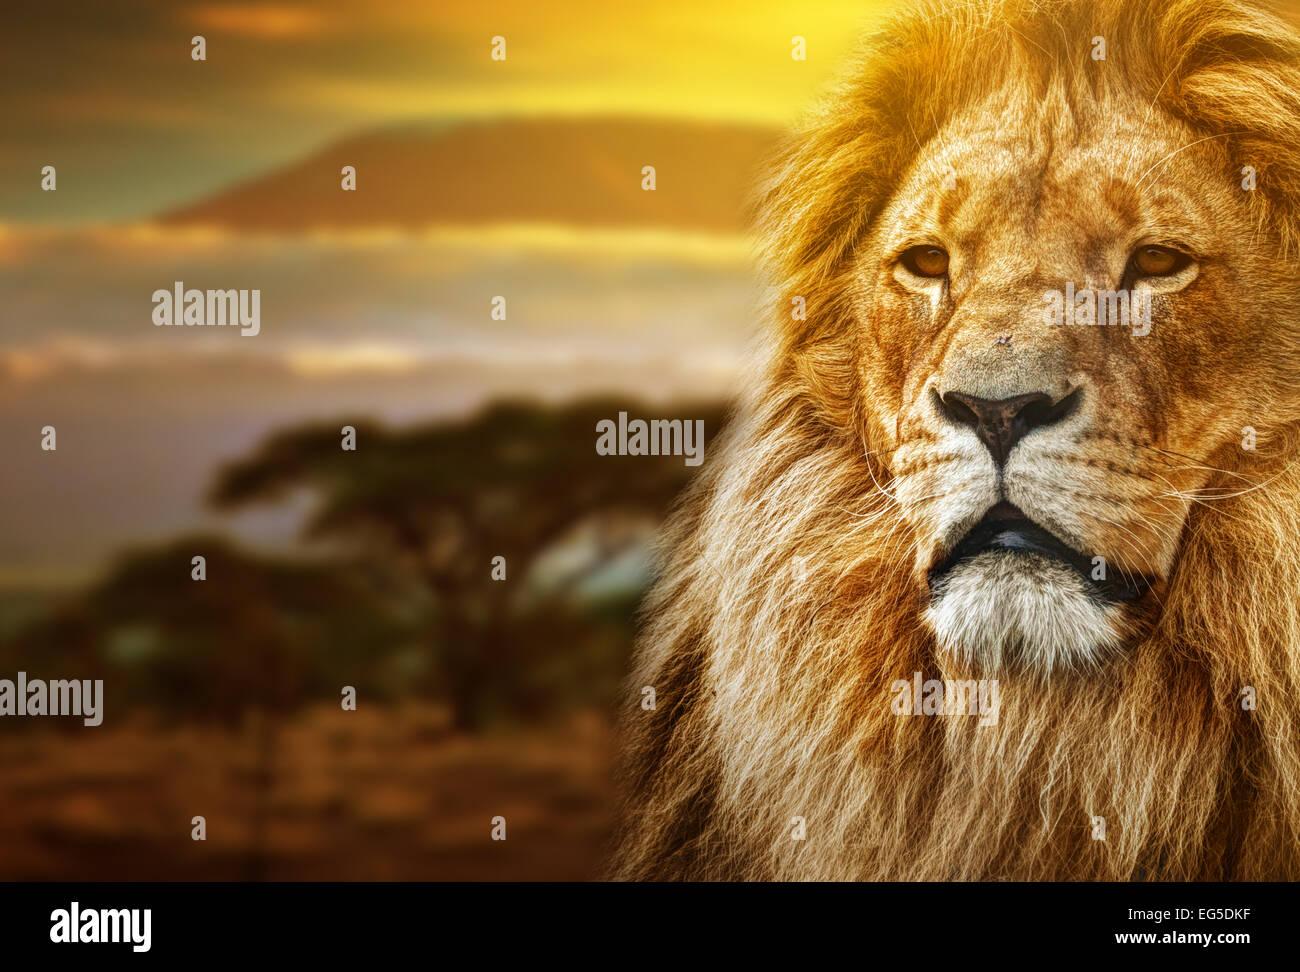 Lion portrait on savanna landscape background and Mount Kilimanjaro at sunset - Stock Image